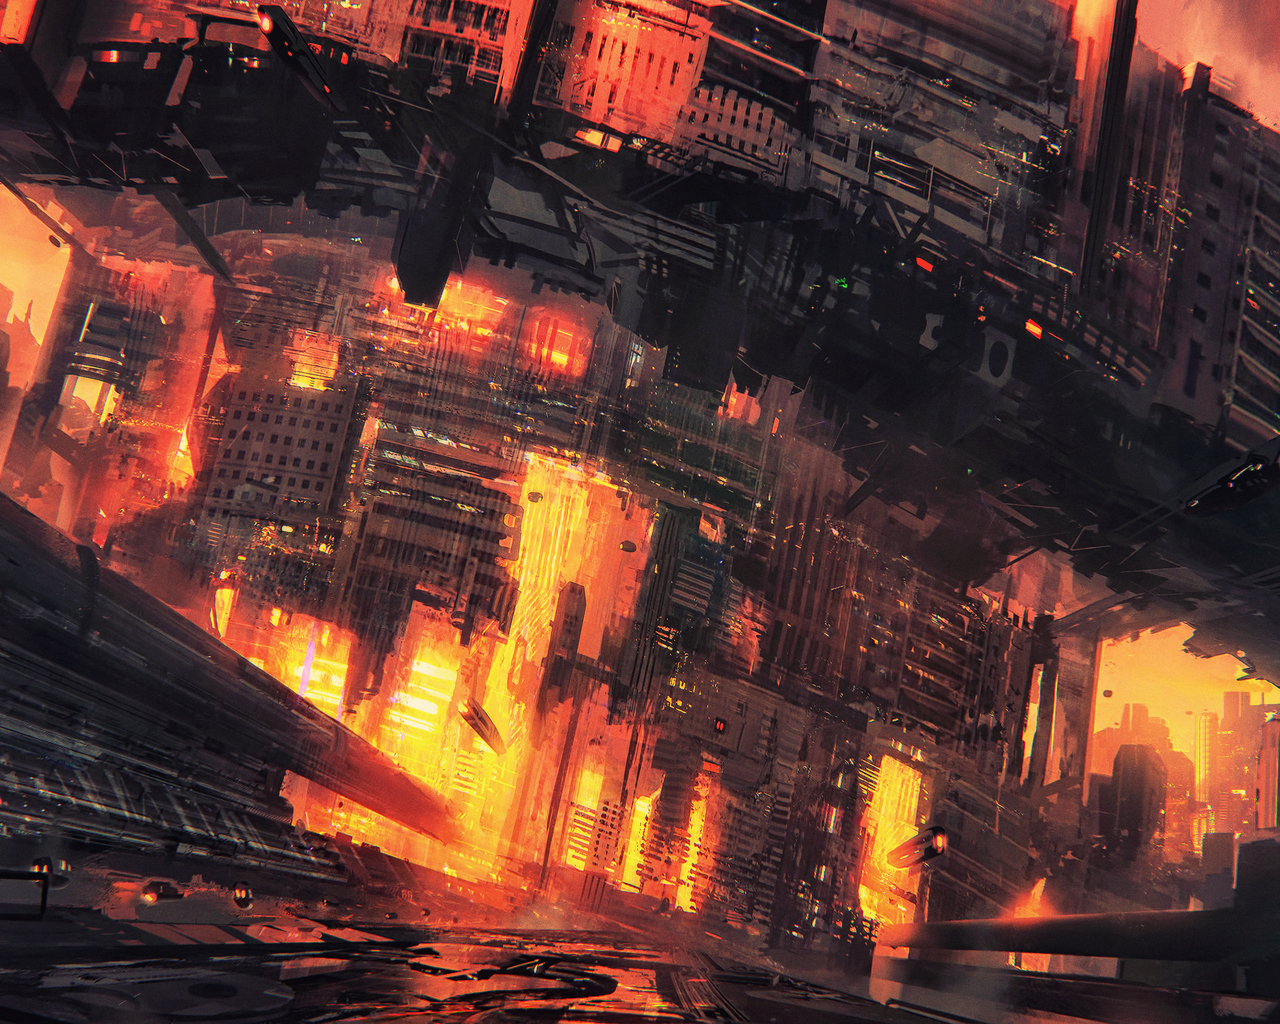 cyberpunk-city-concept-art-4k-we.jpg